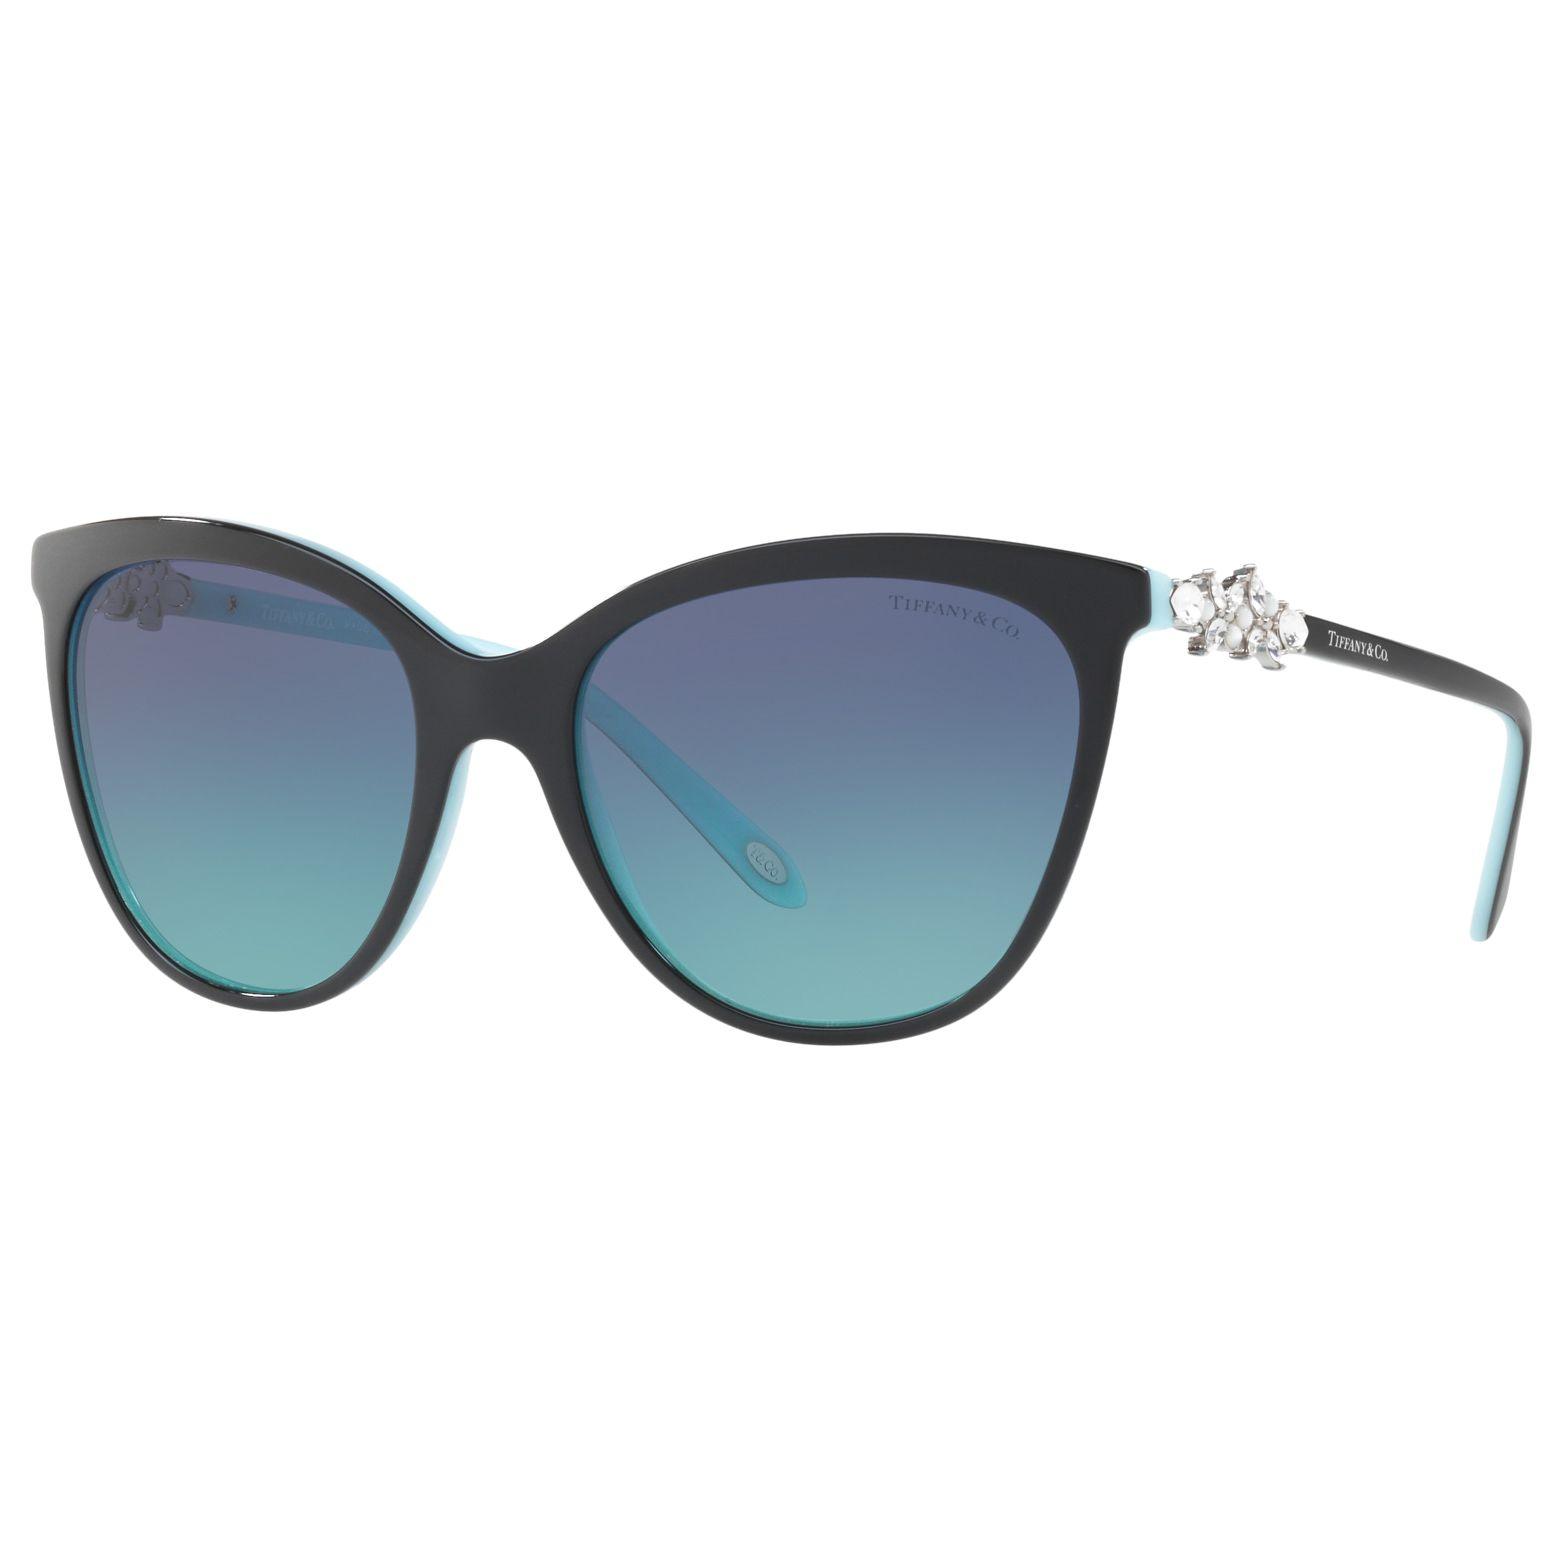 Tiffany & Co Tiffany & Co TF4131HB Embellished Cat's Eye Sunglasses